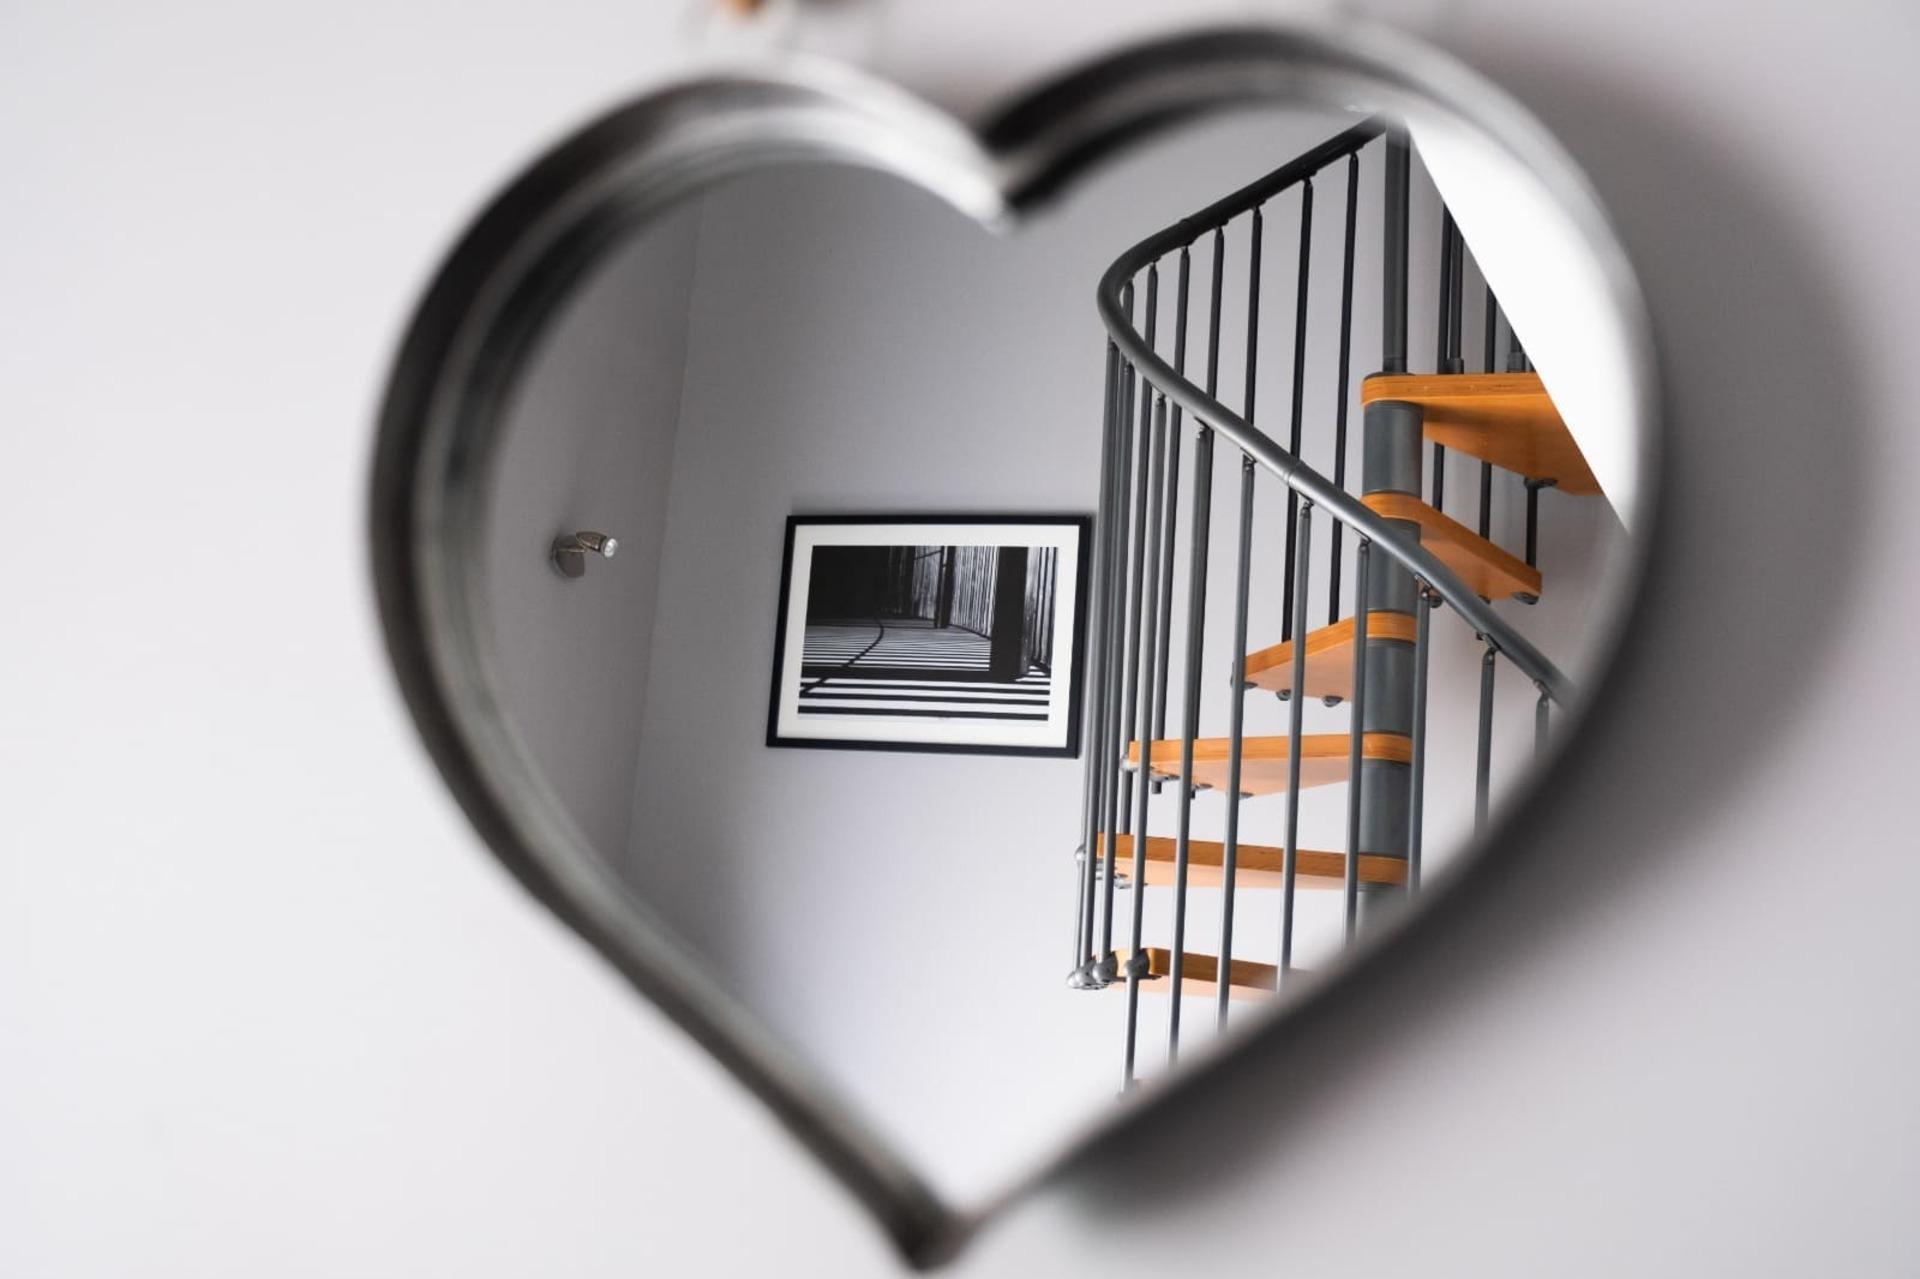 Reflet du coeur